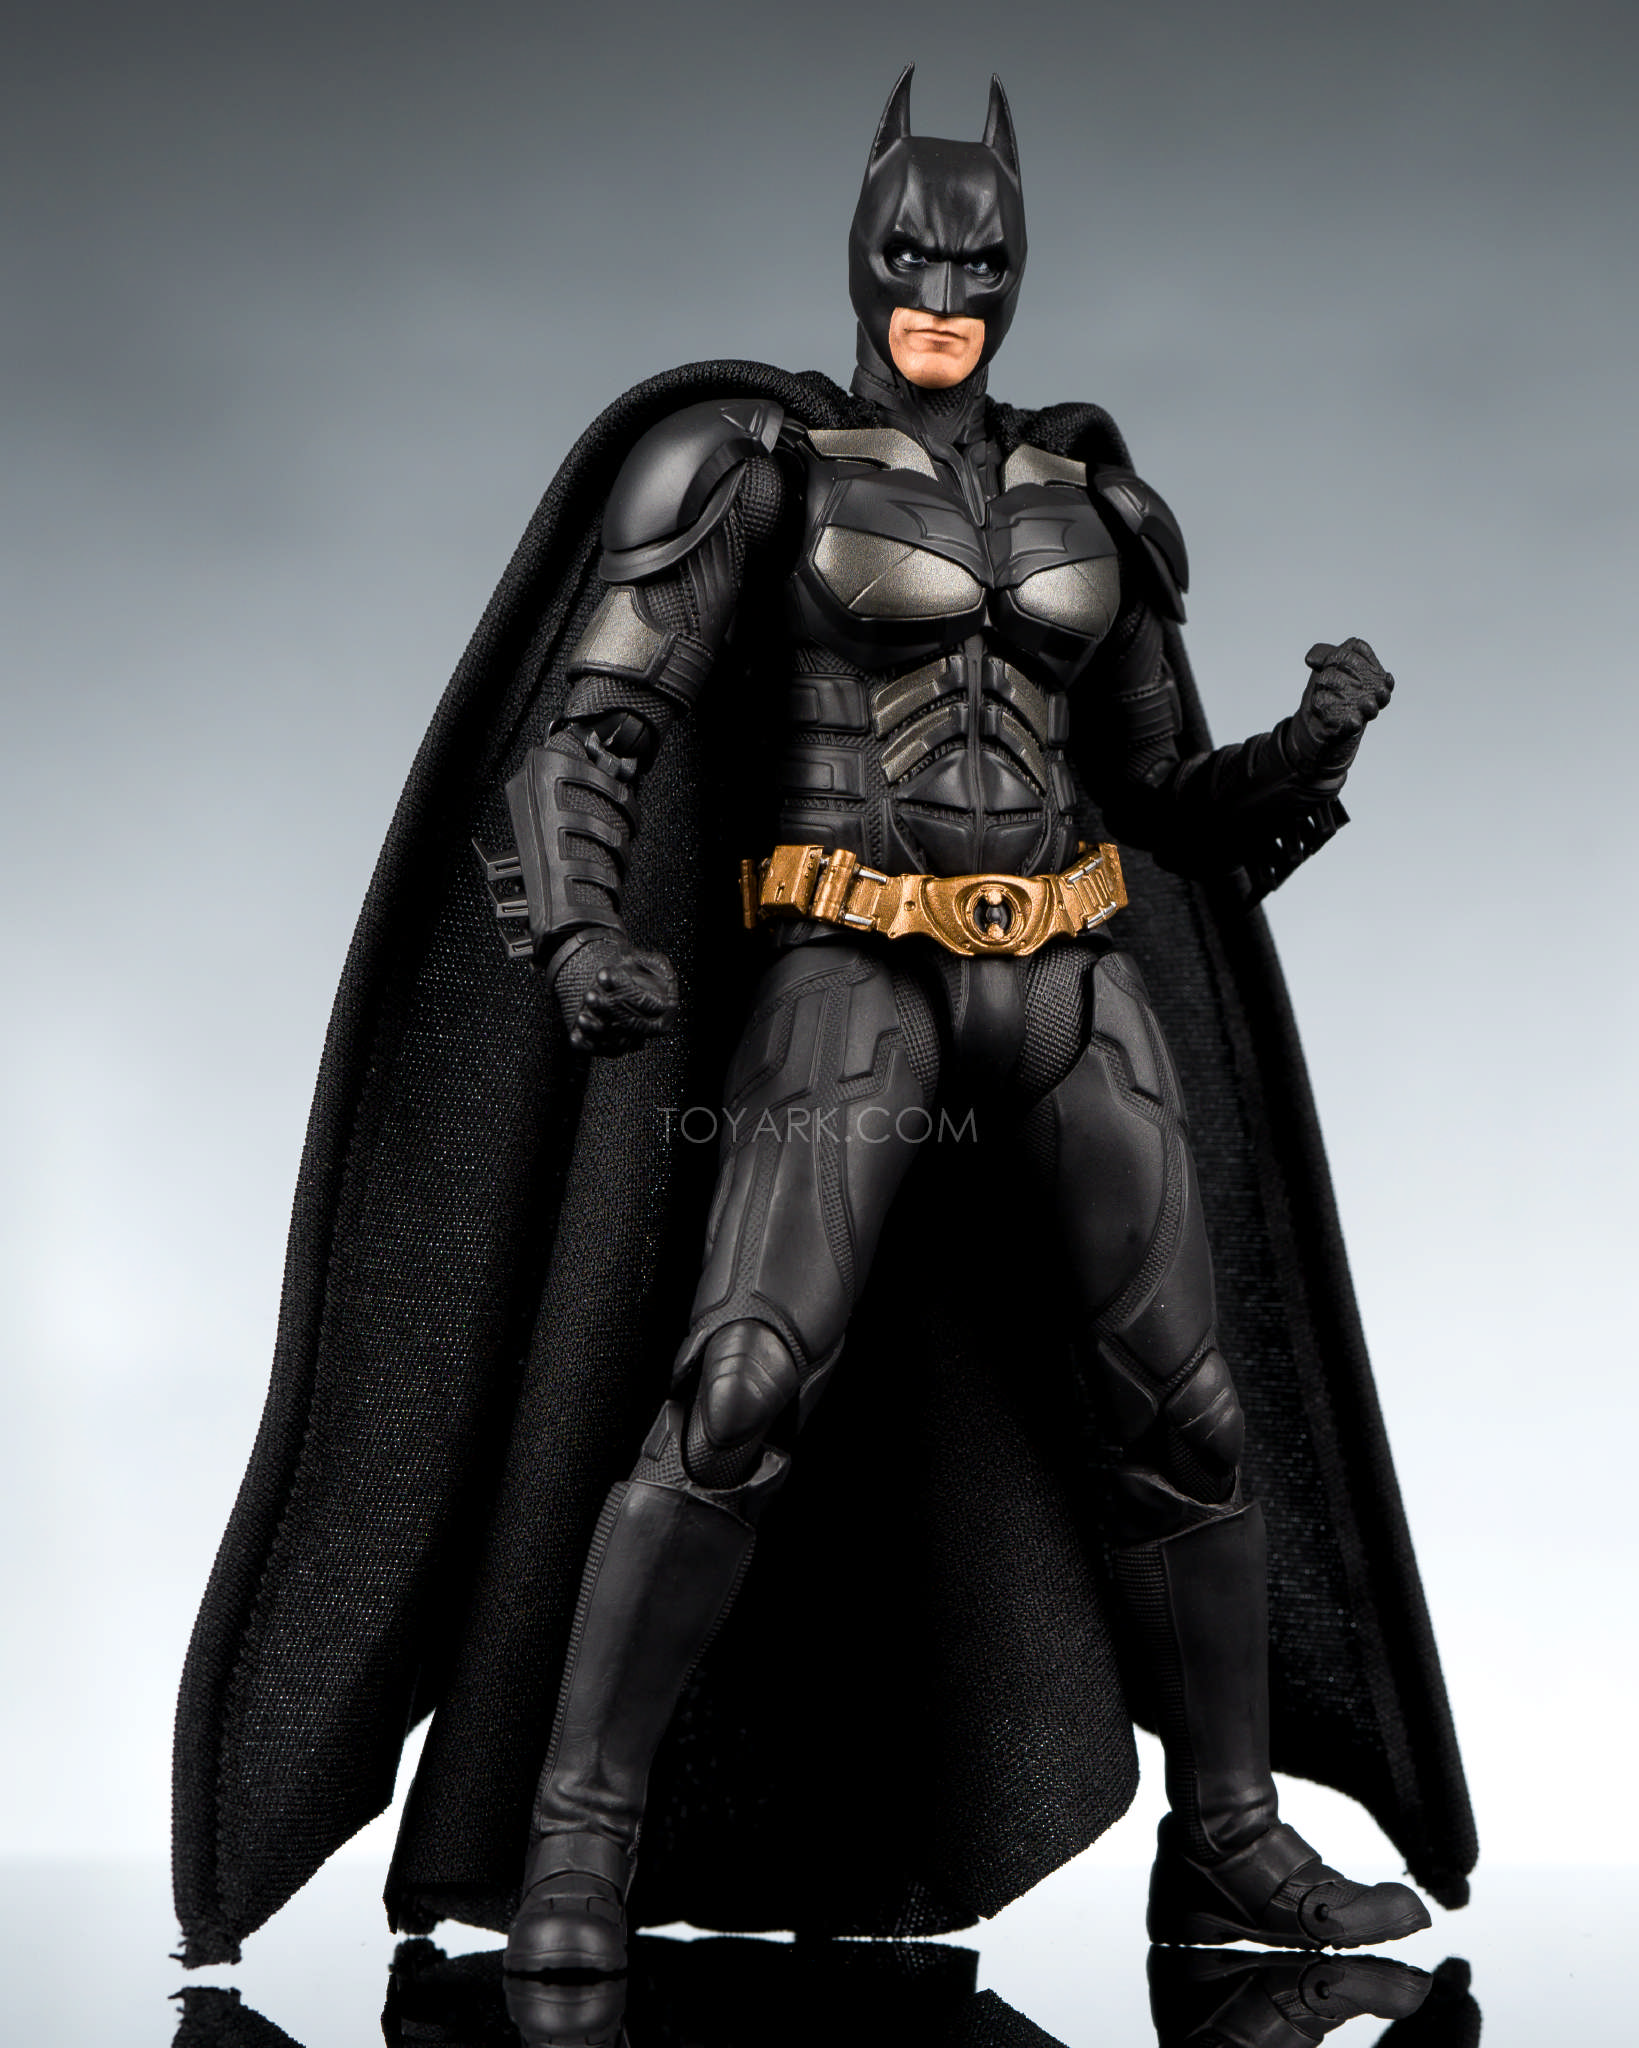 Sh Figuarts The Dark Knight Batman  Early Inhand First